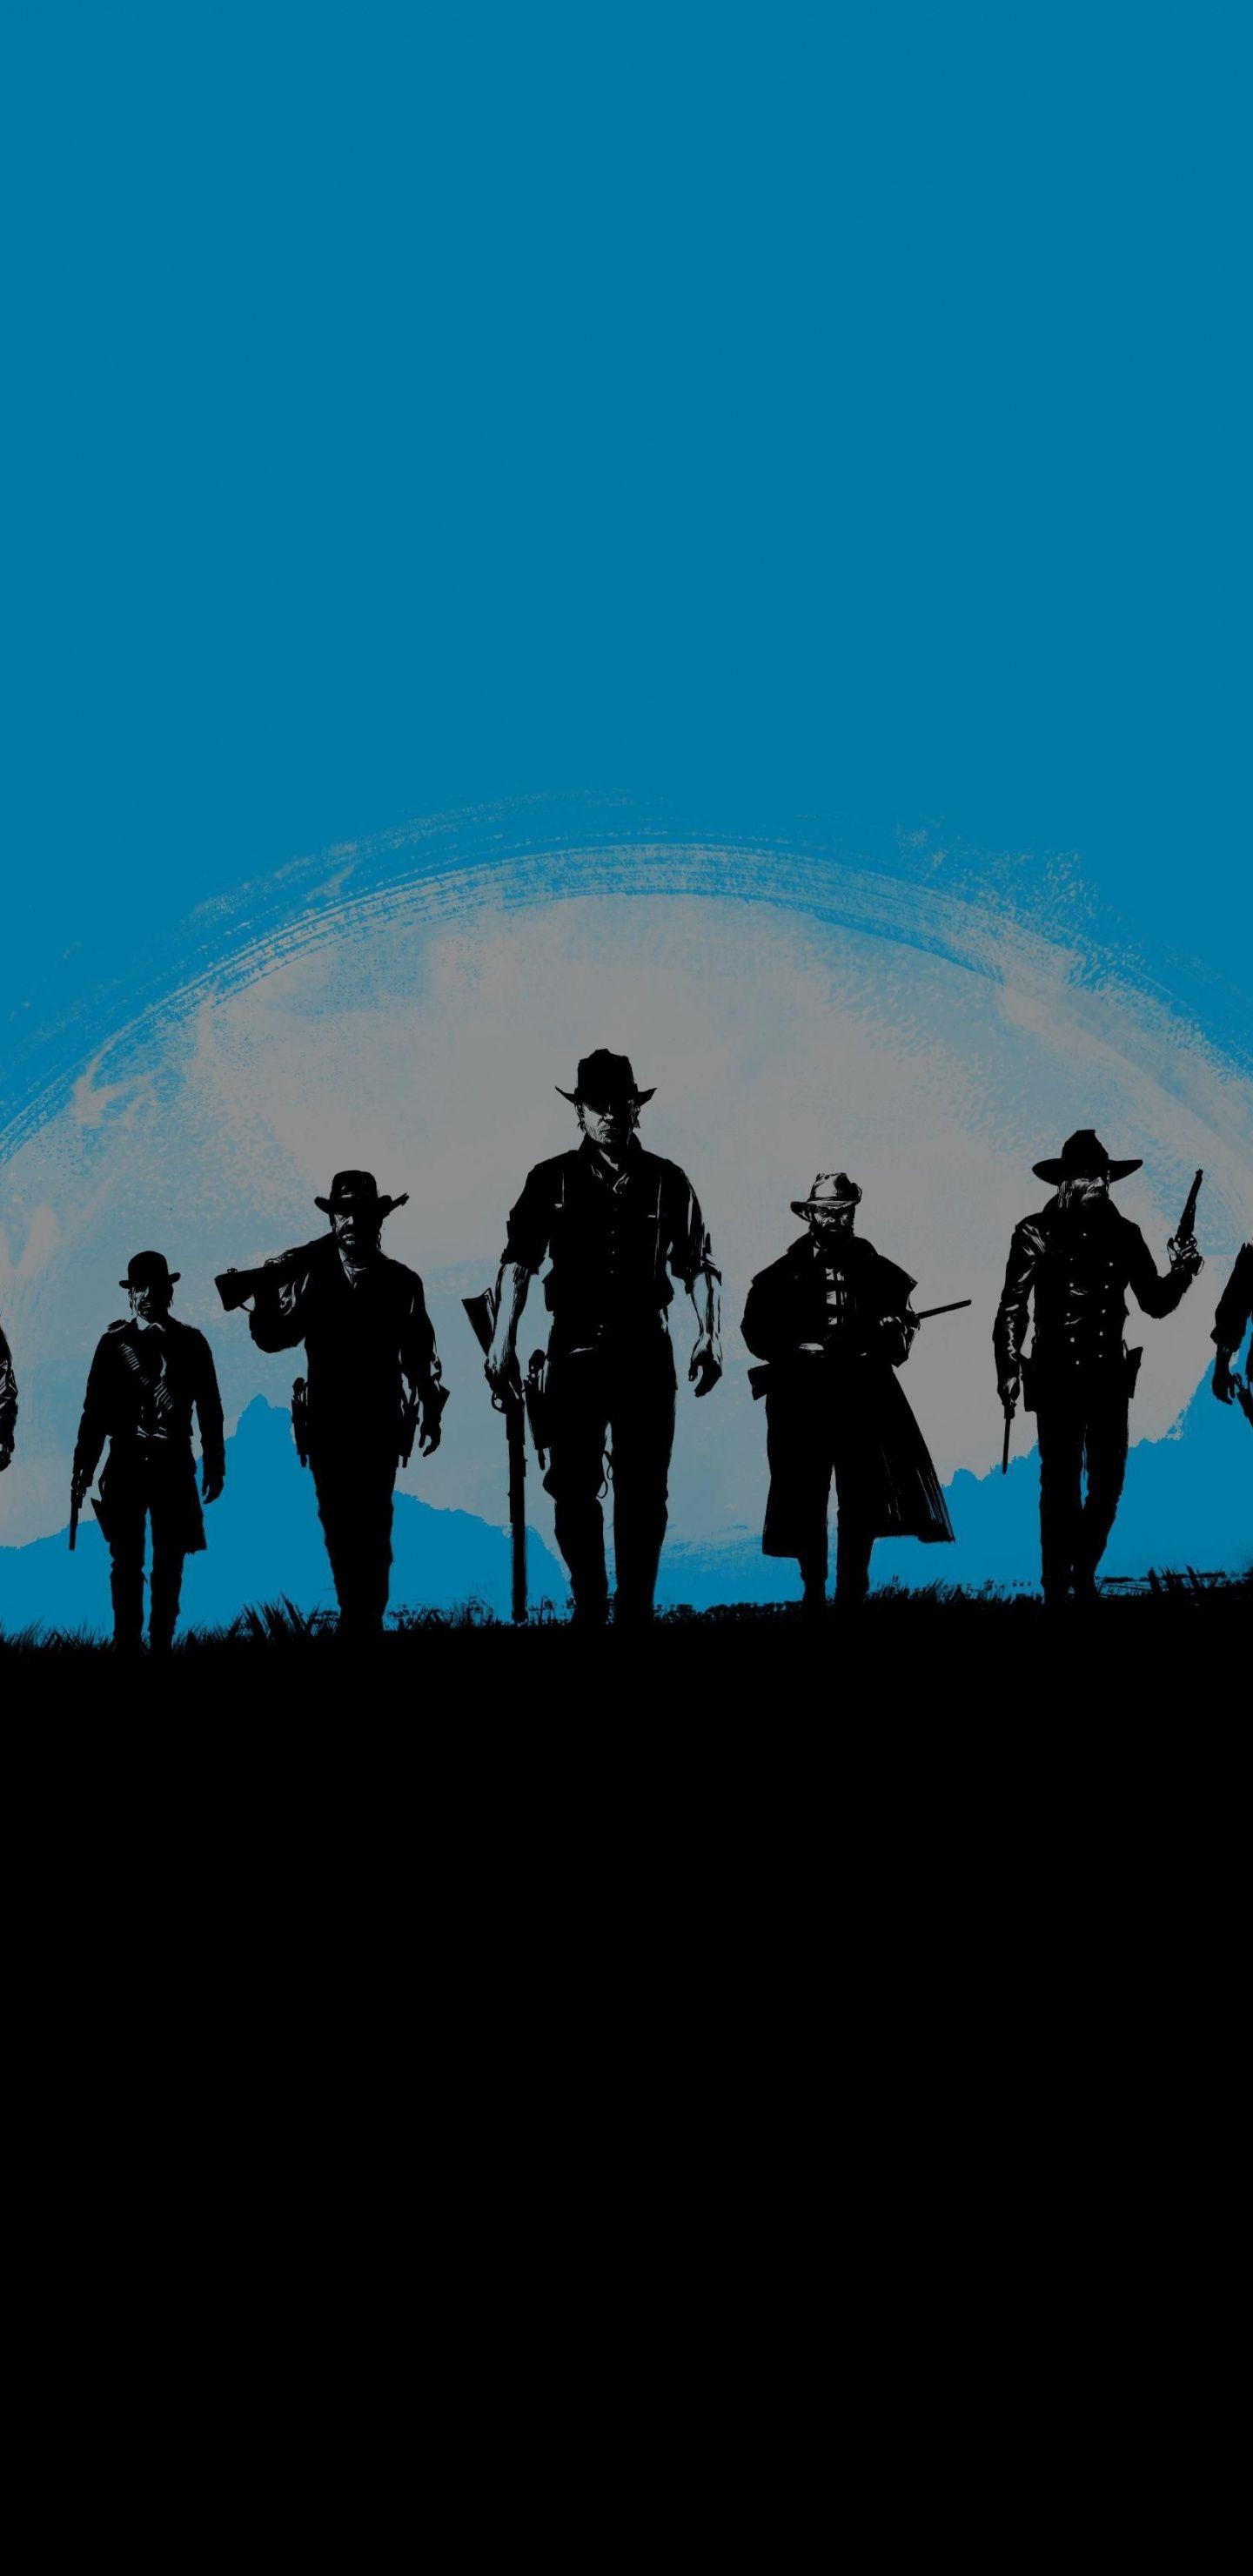 Red Dead Redemption 2 Blue Poster Artwork Minimal 1440x2960